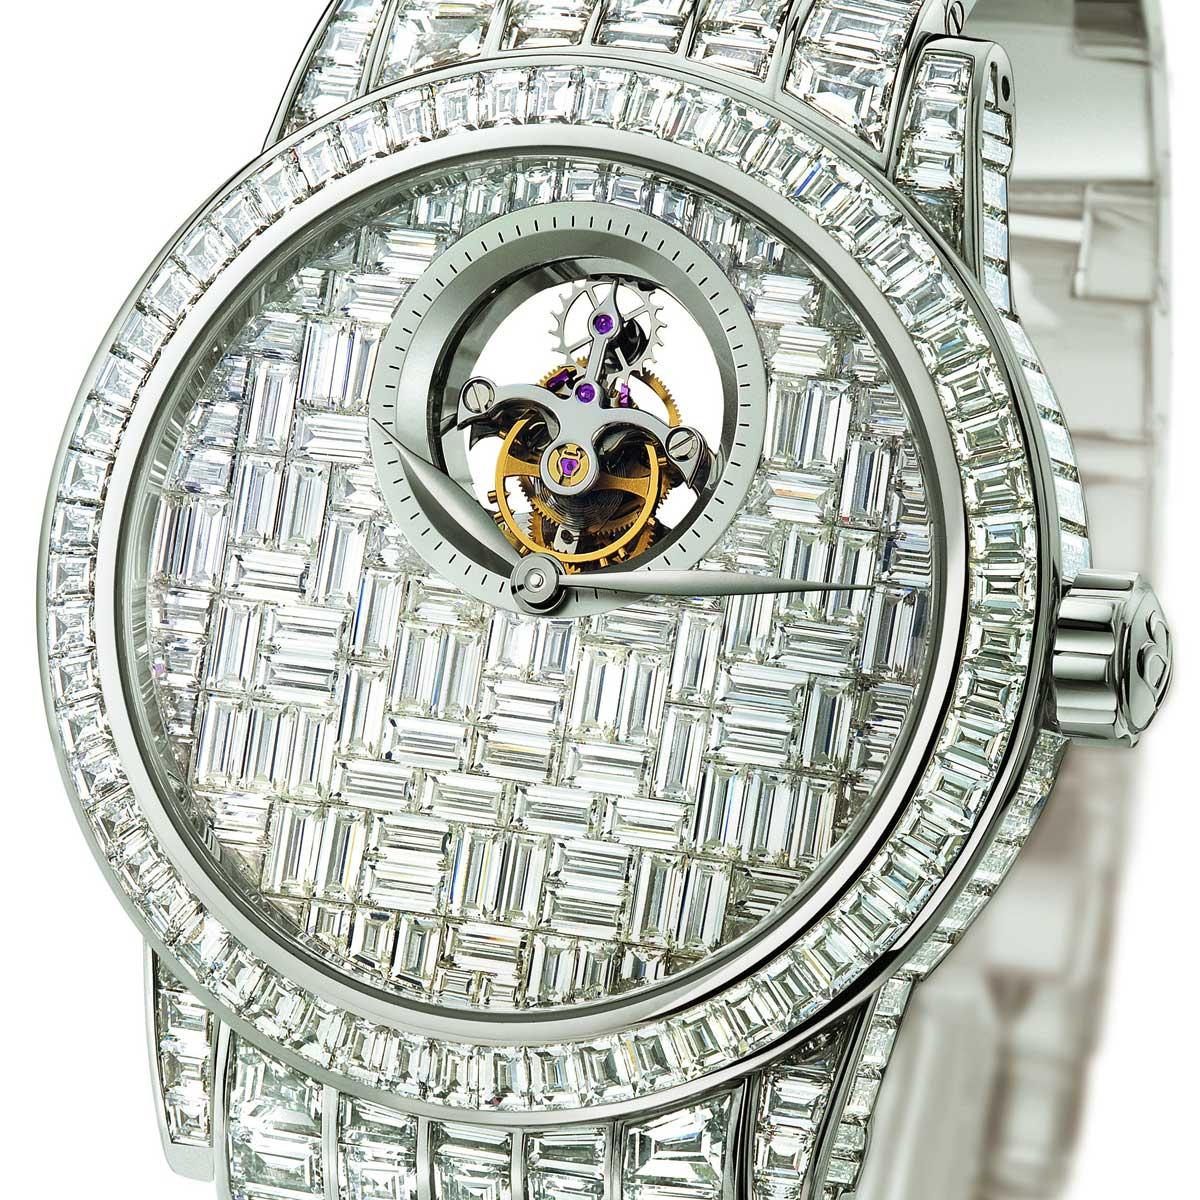 blanxcpain tourbilon diamant